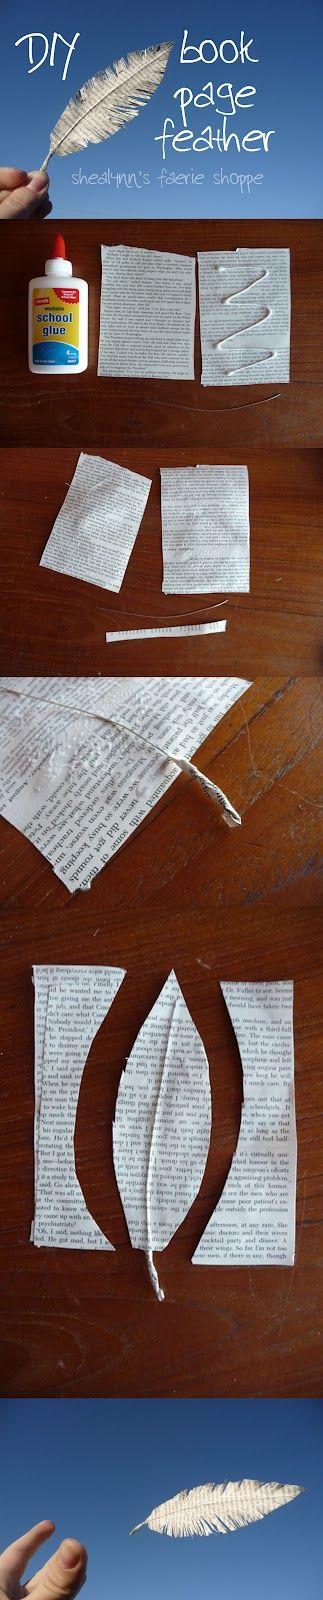 Shealynn's Faerie Shoppe: Paper Feather